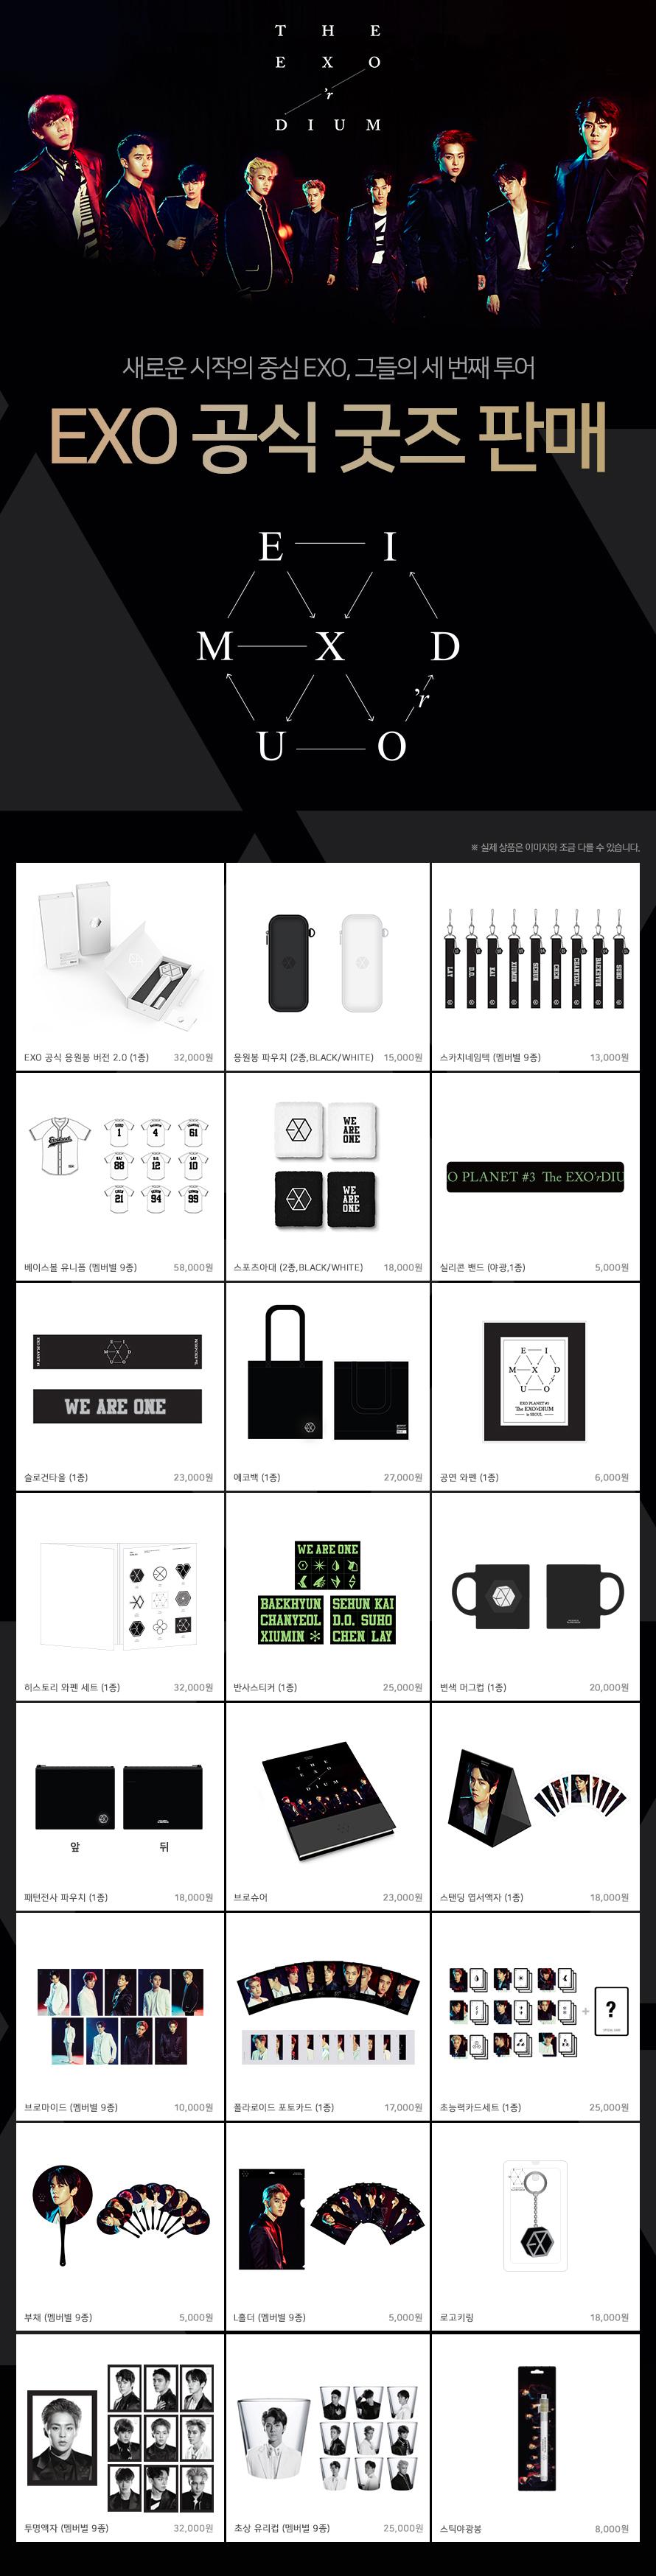 EXO The EXO'rdium in Seoul merch.png